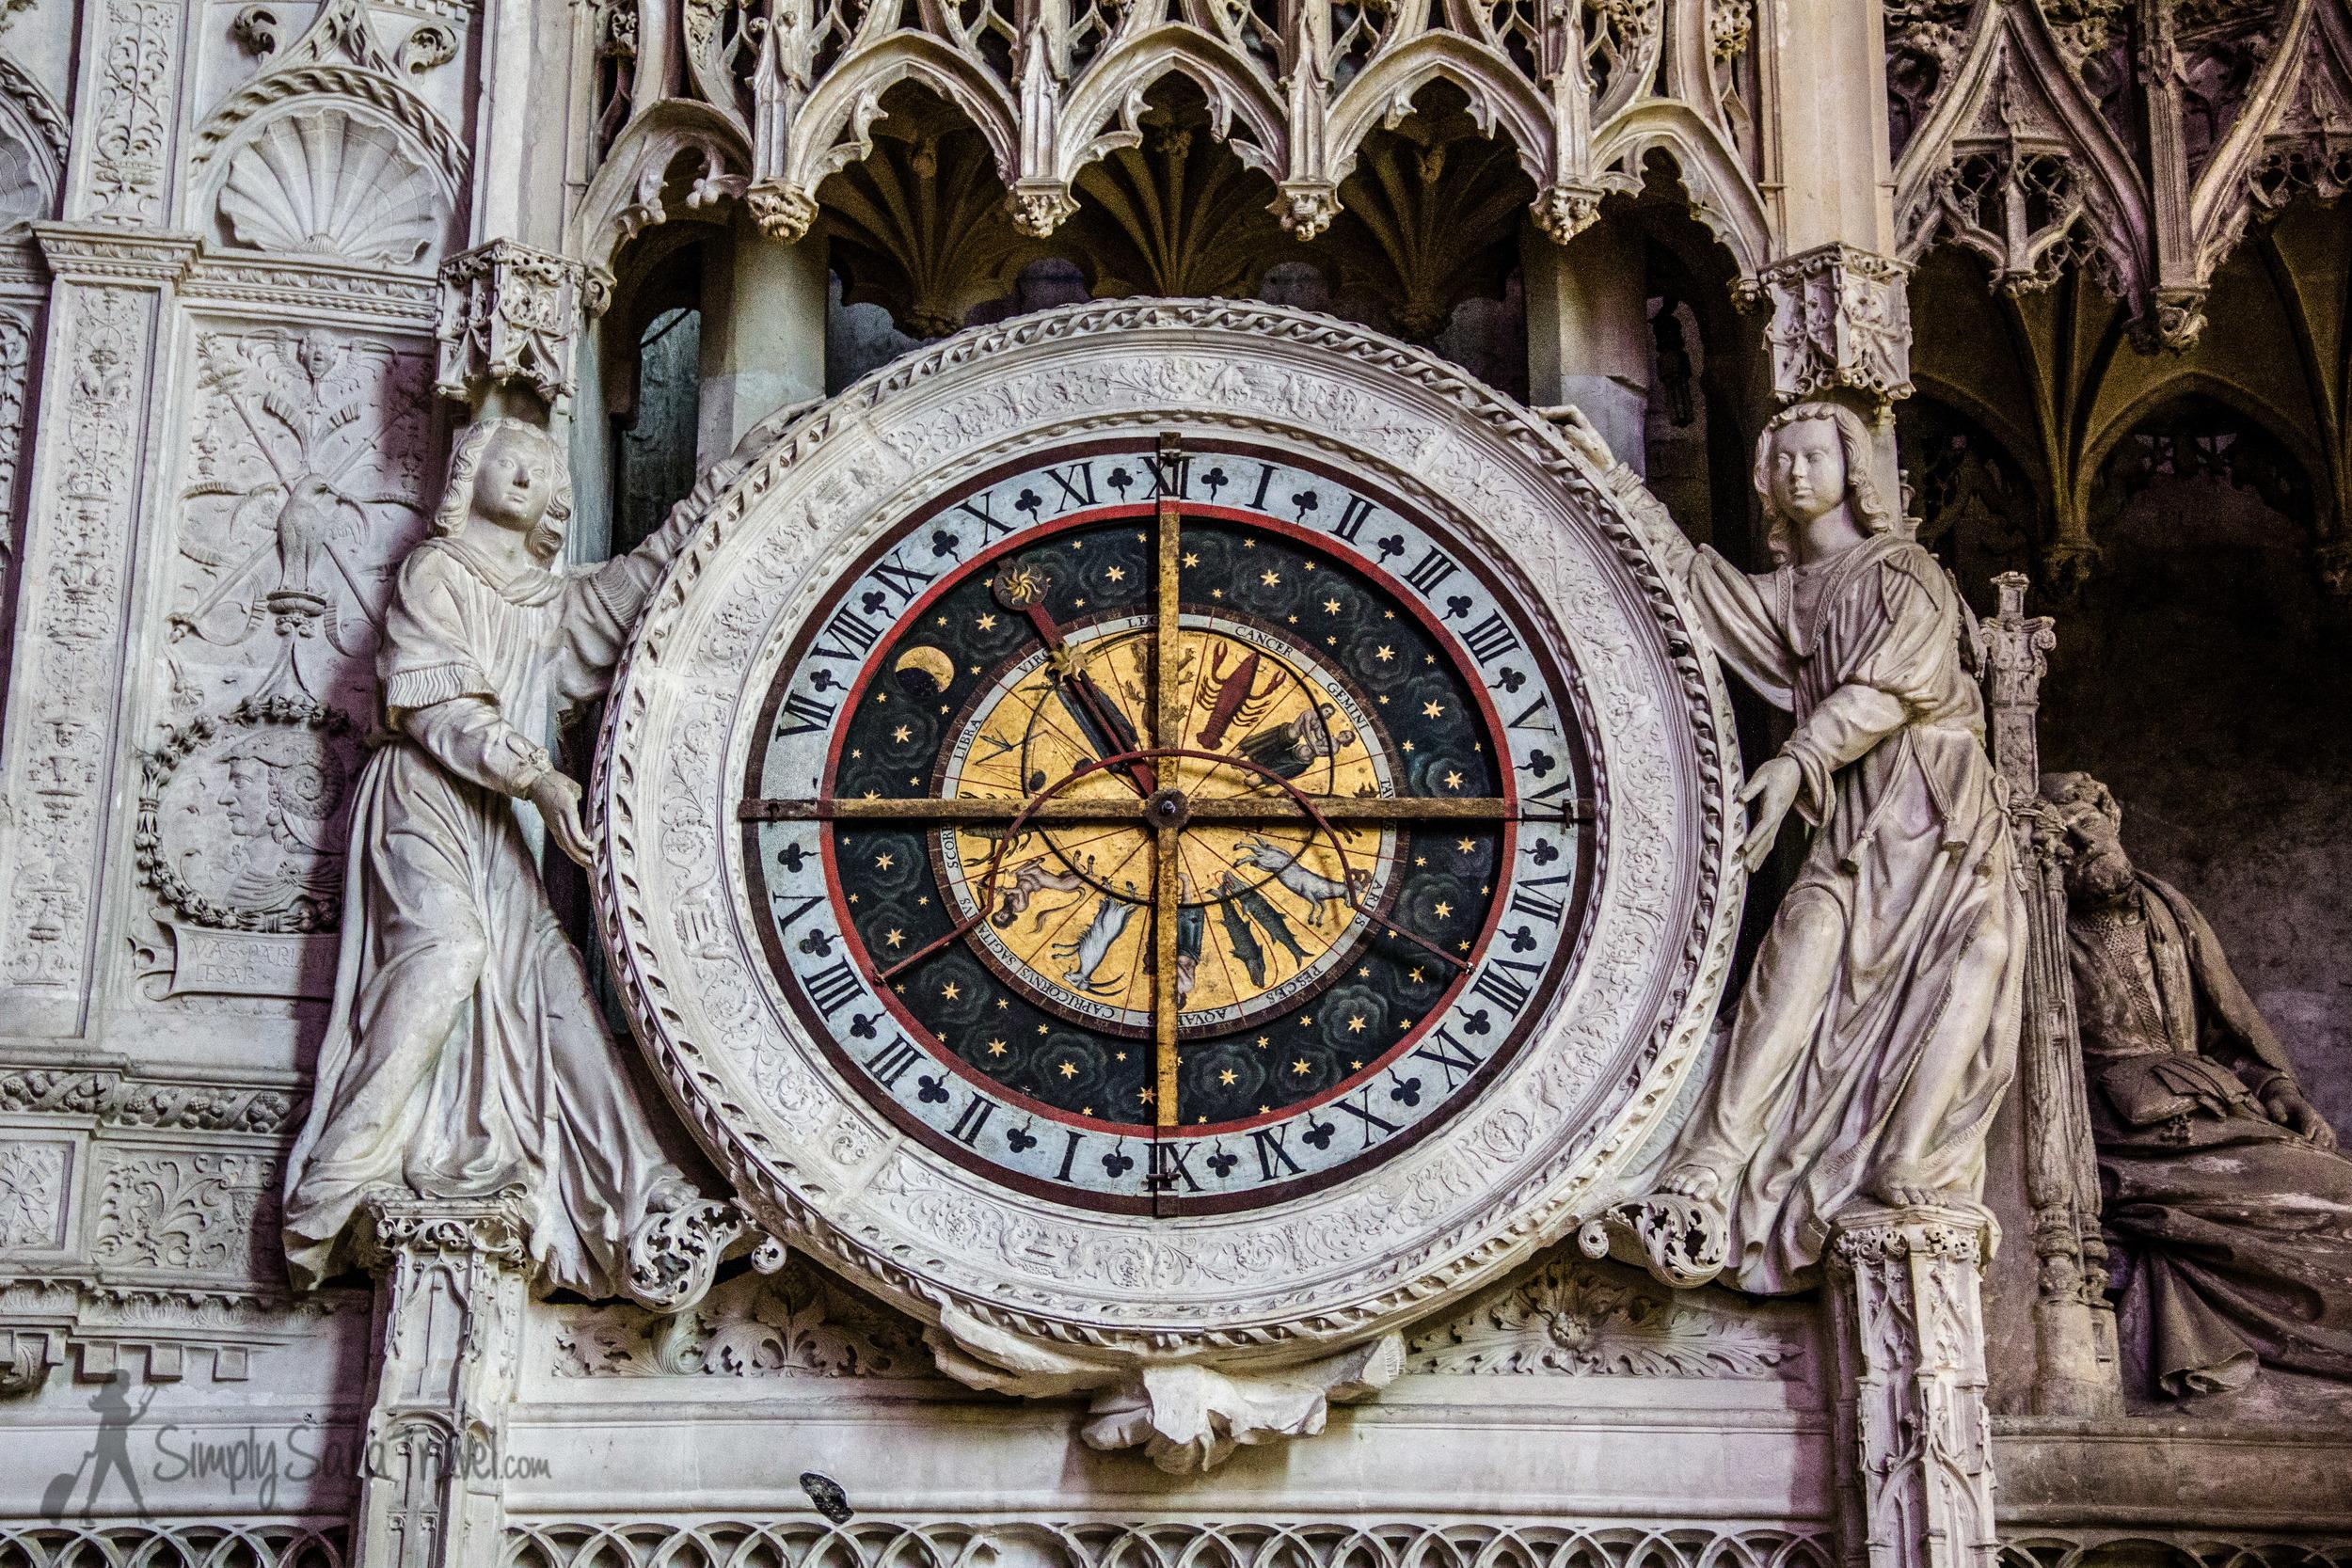 16th centuryAstrological Clock in the choir screen